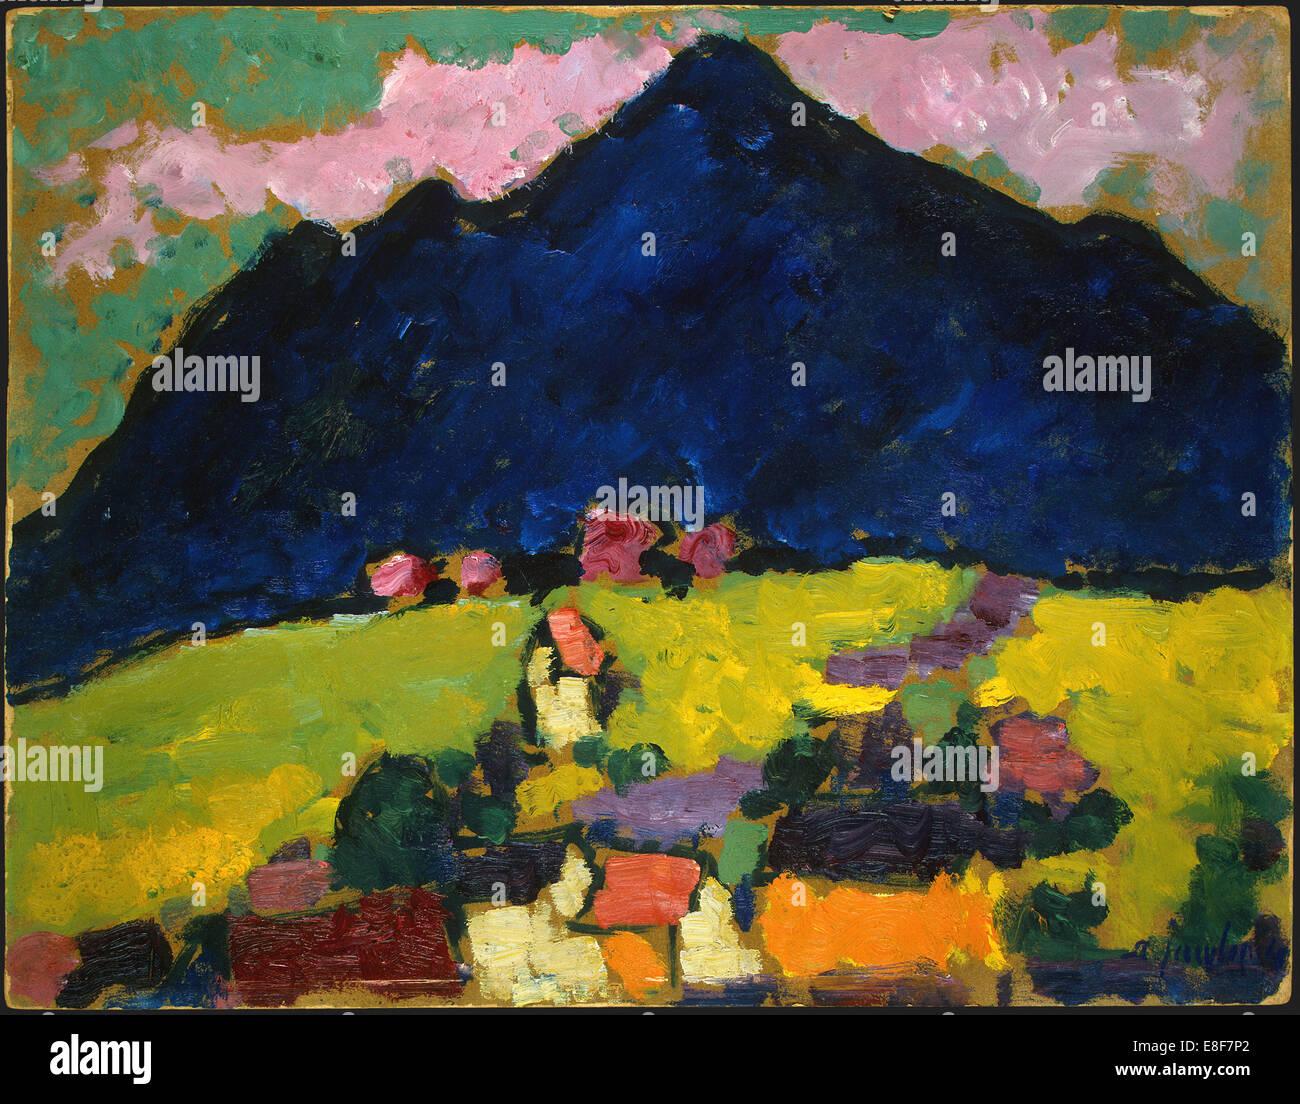 Murnau. Künstler: Jawlensky, Alexei, von (1864-1941) Stockbild